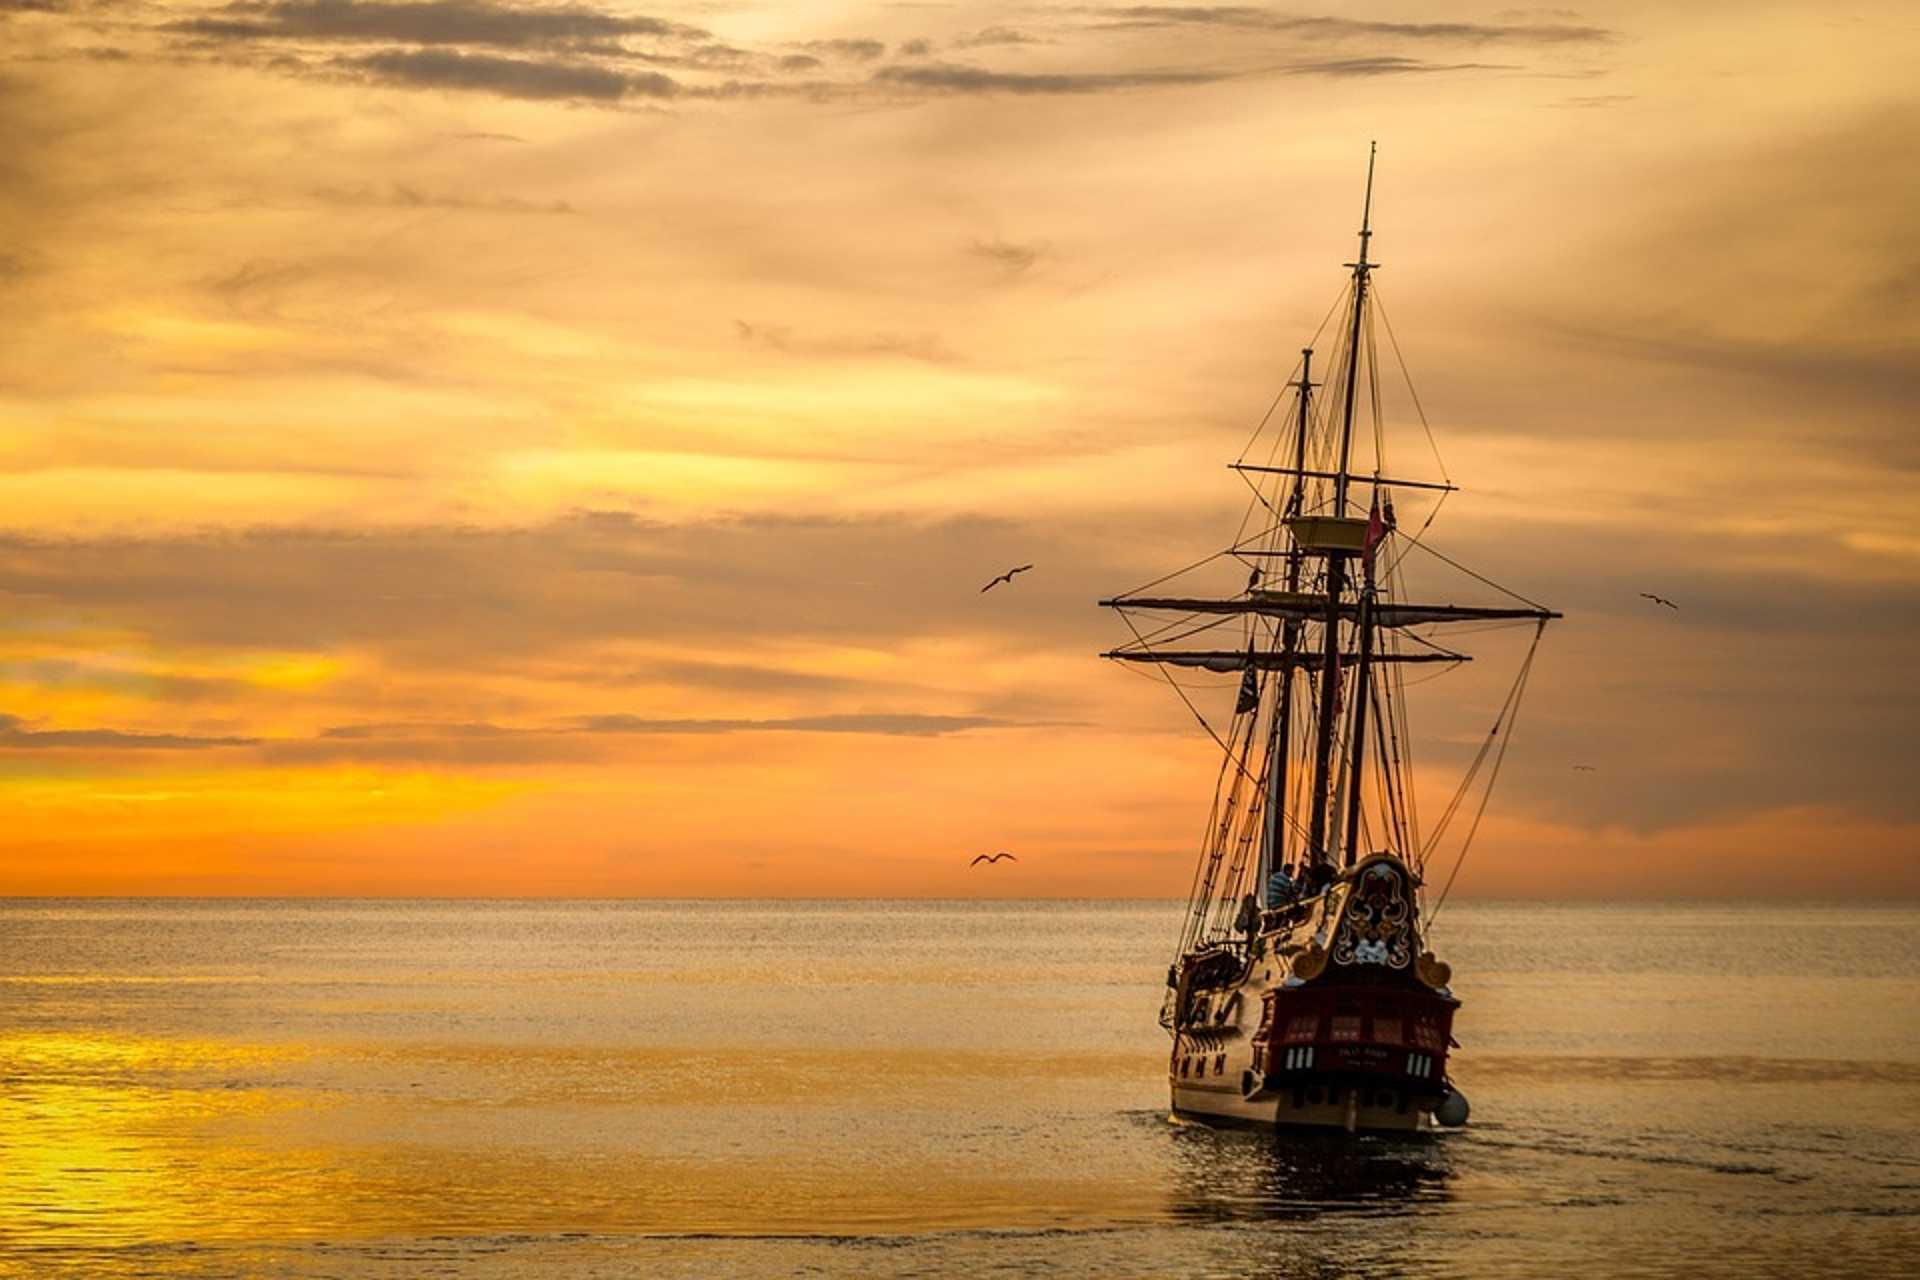 Sunset, Sailing Boat, Boat, Sea, Ship